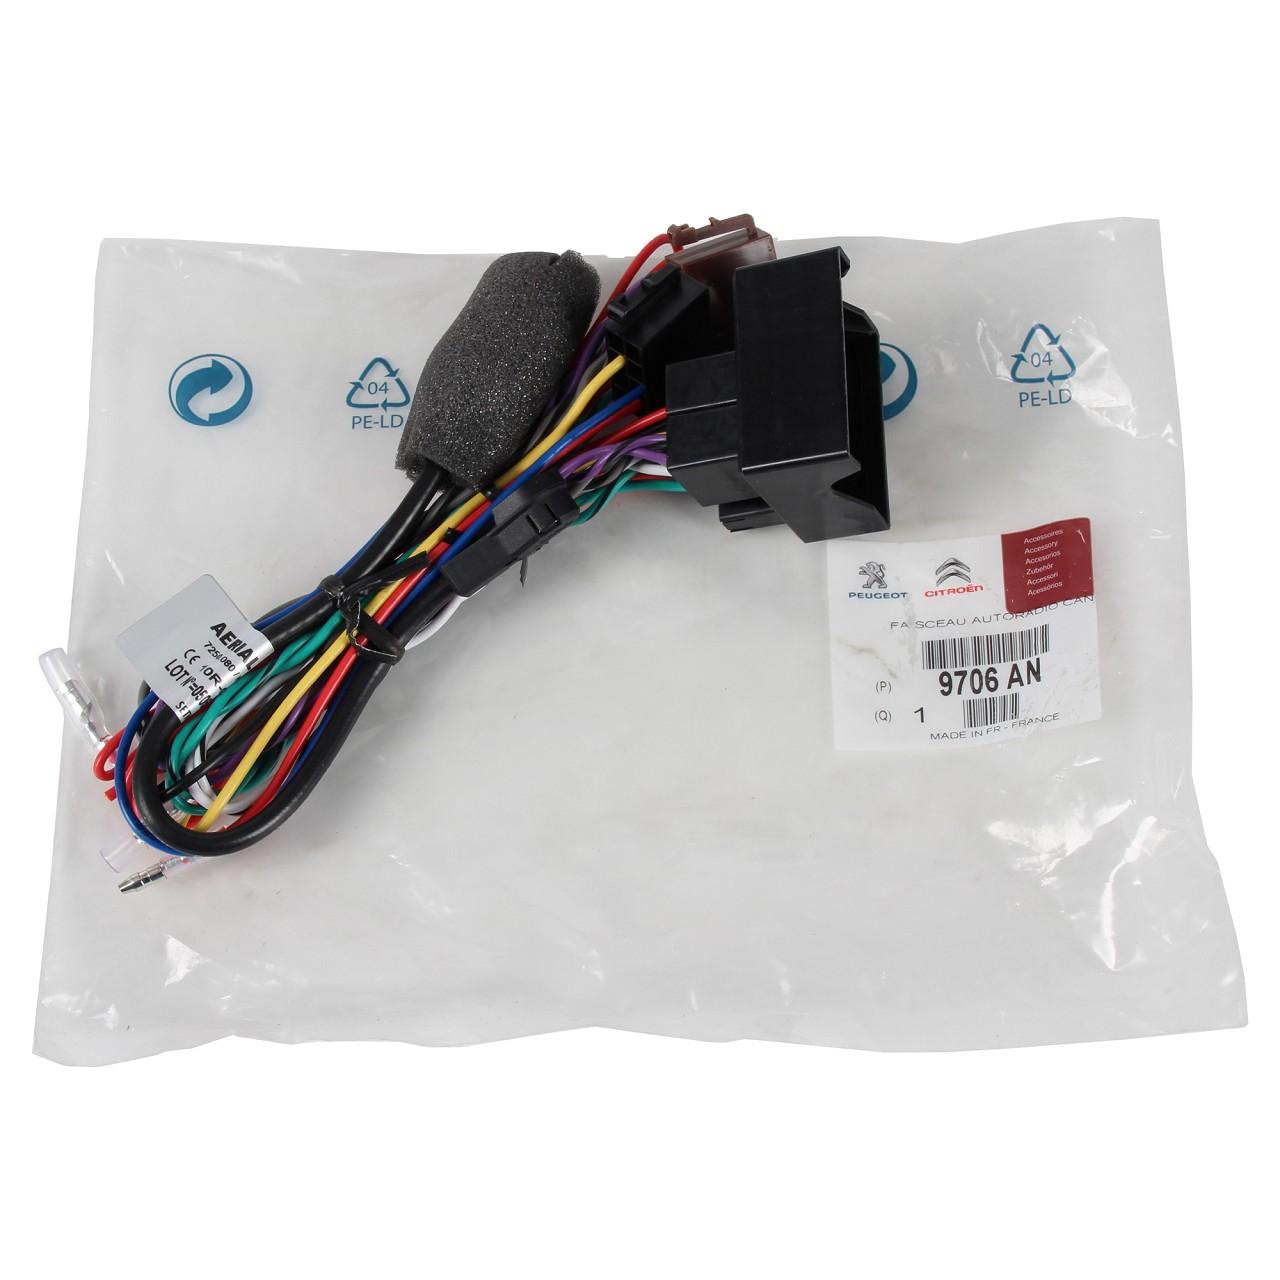 ORIGINAL Citroen Peugeot Radio Adapter Adapterkabel Radionachrüstung 9706.AN